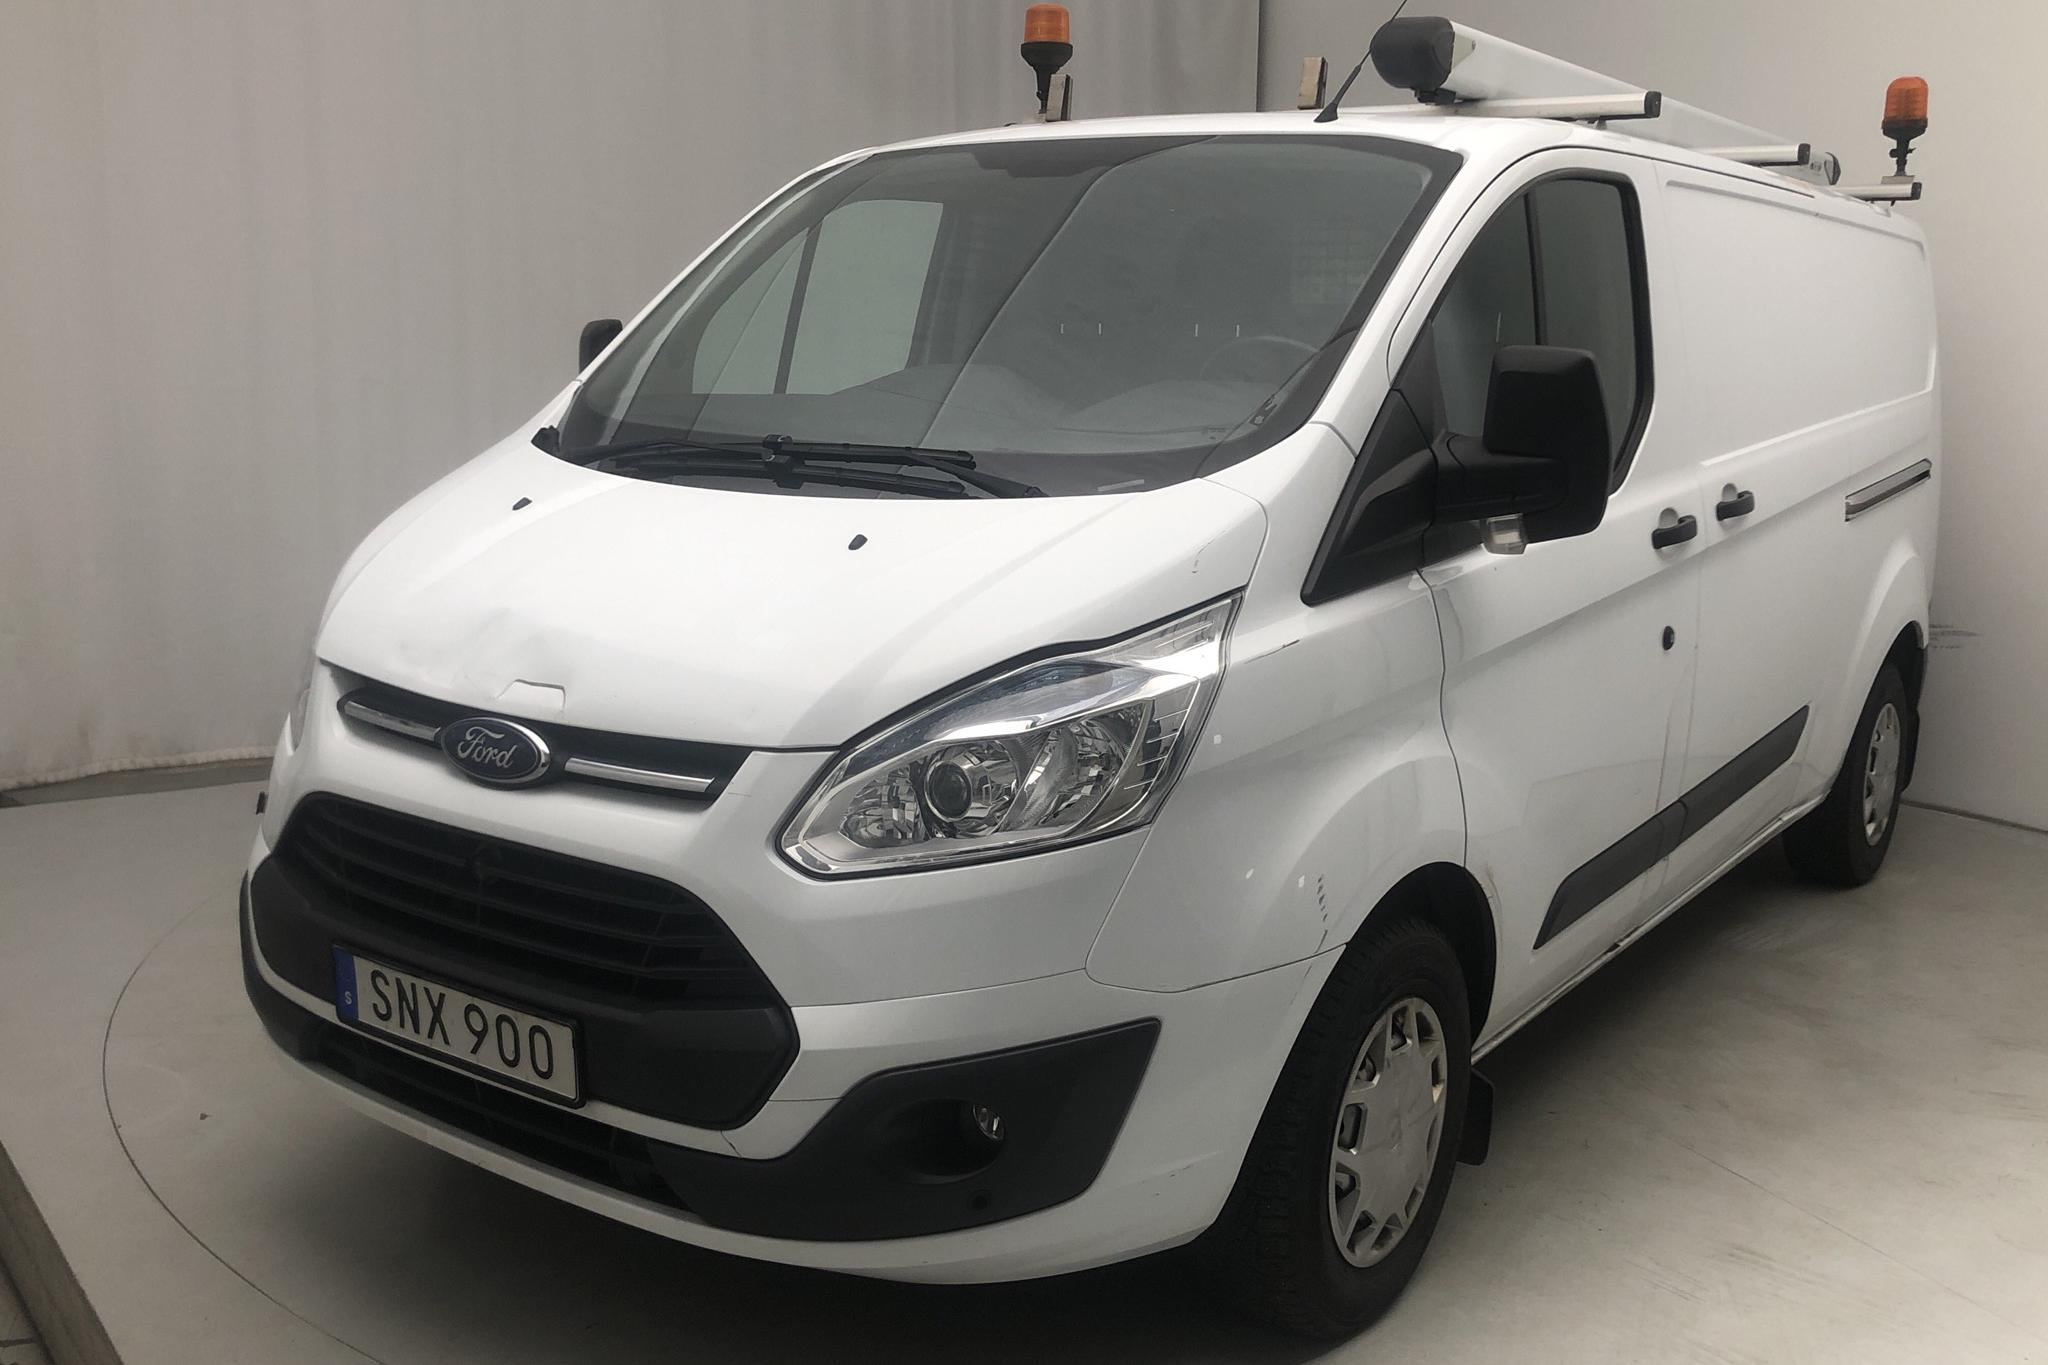 Ford Transit Custom 300 (125hk) - 106 910 km - Manual - white - 2015